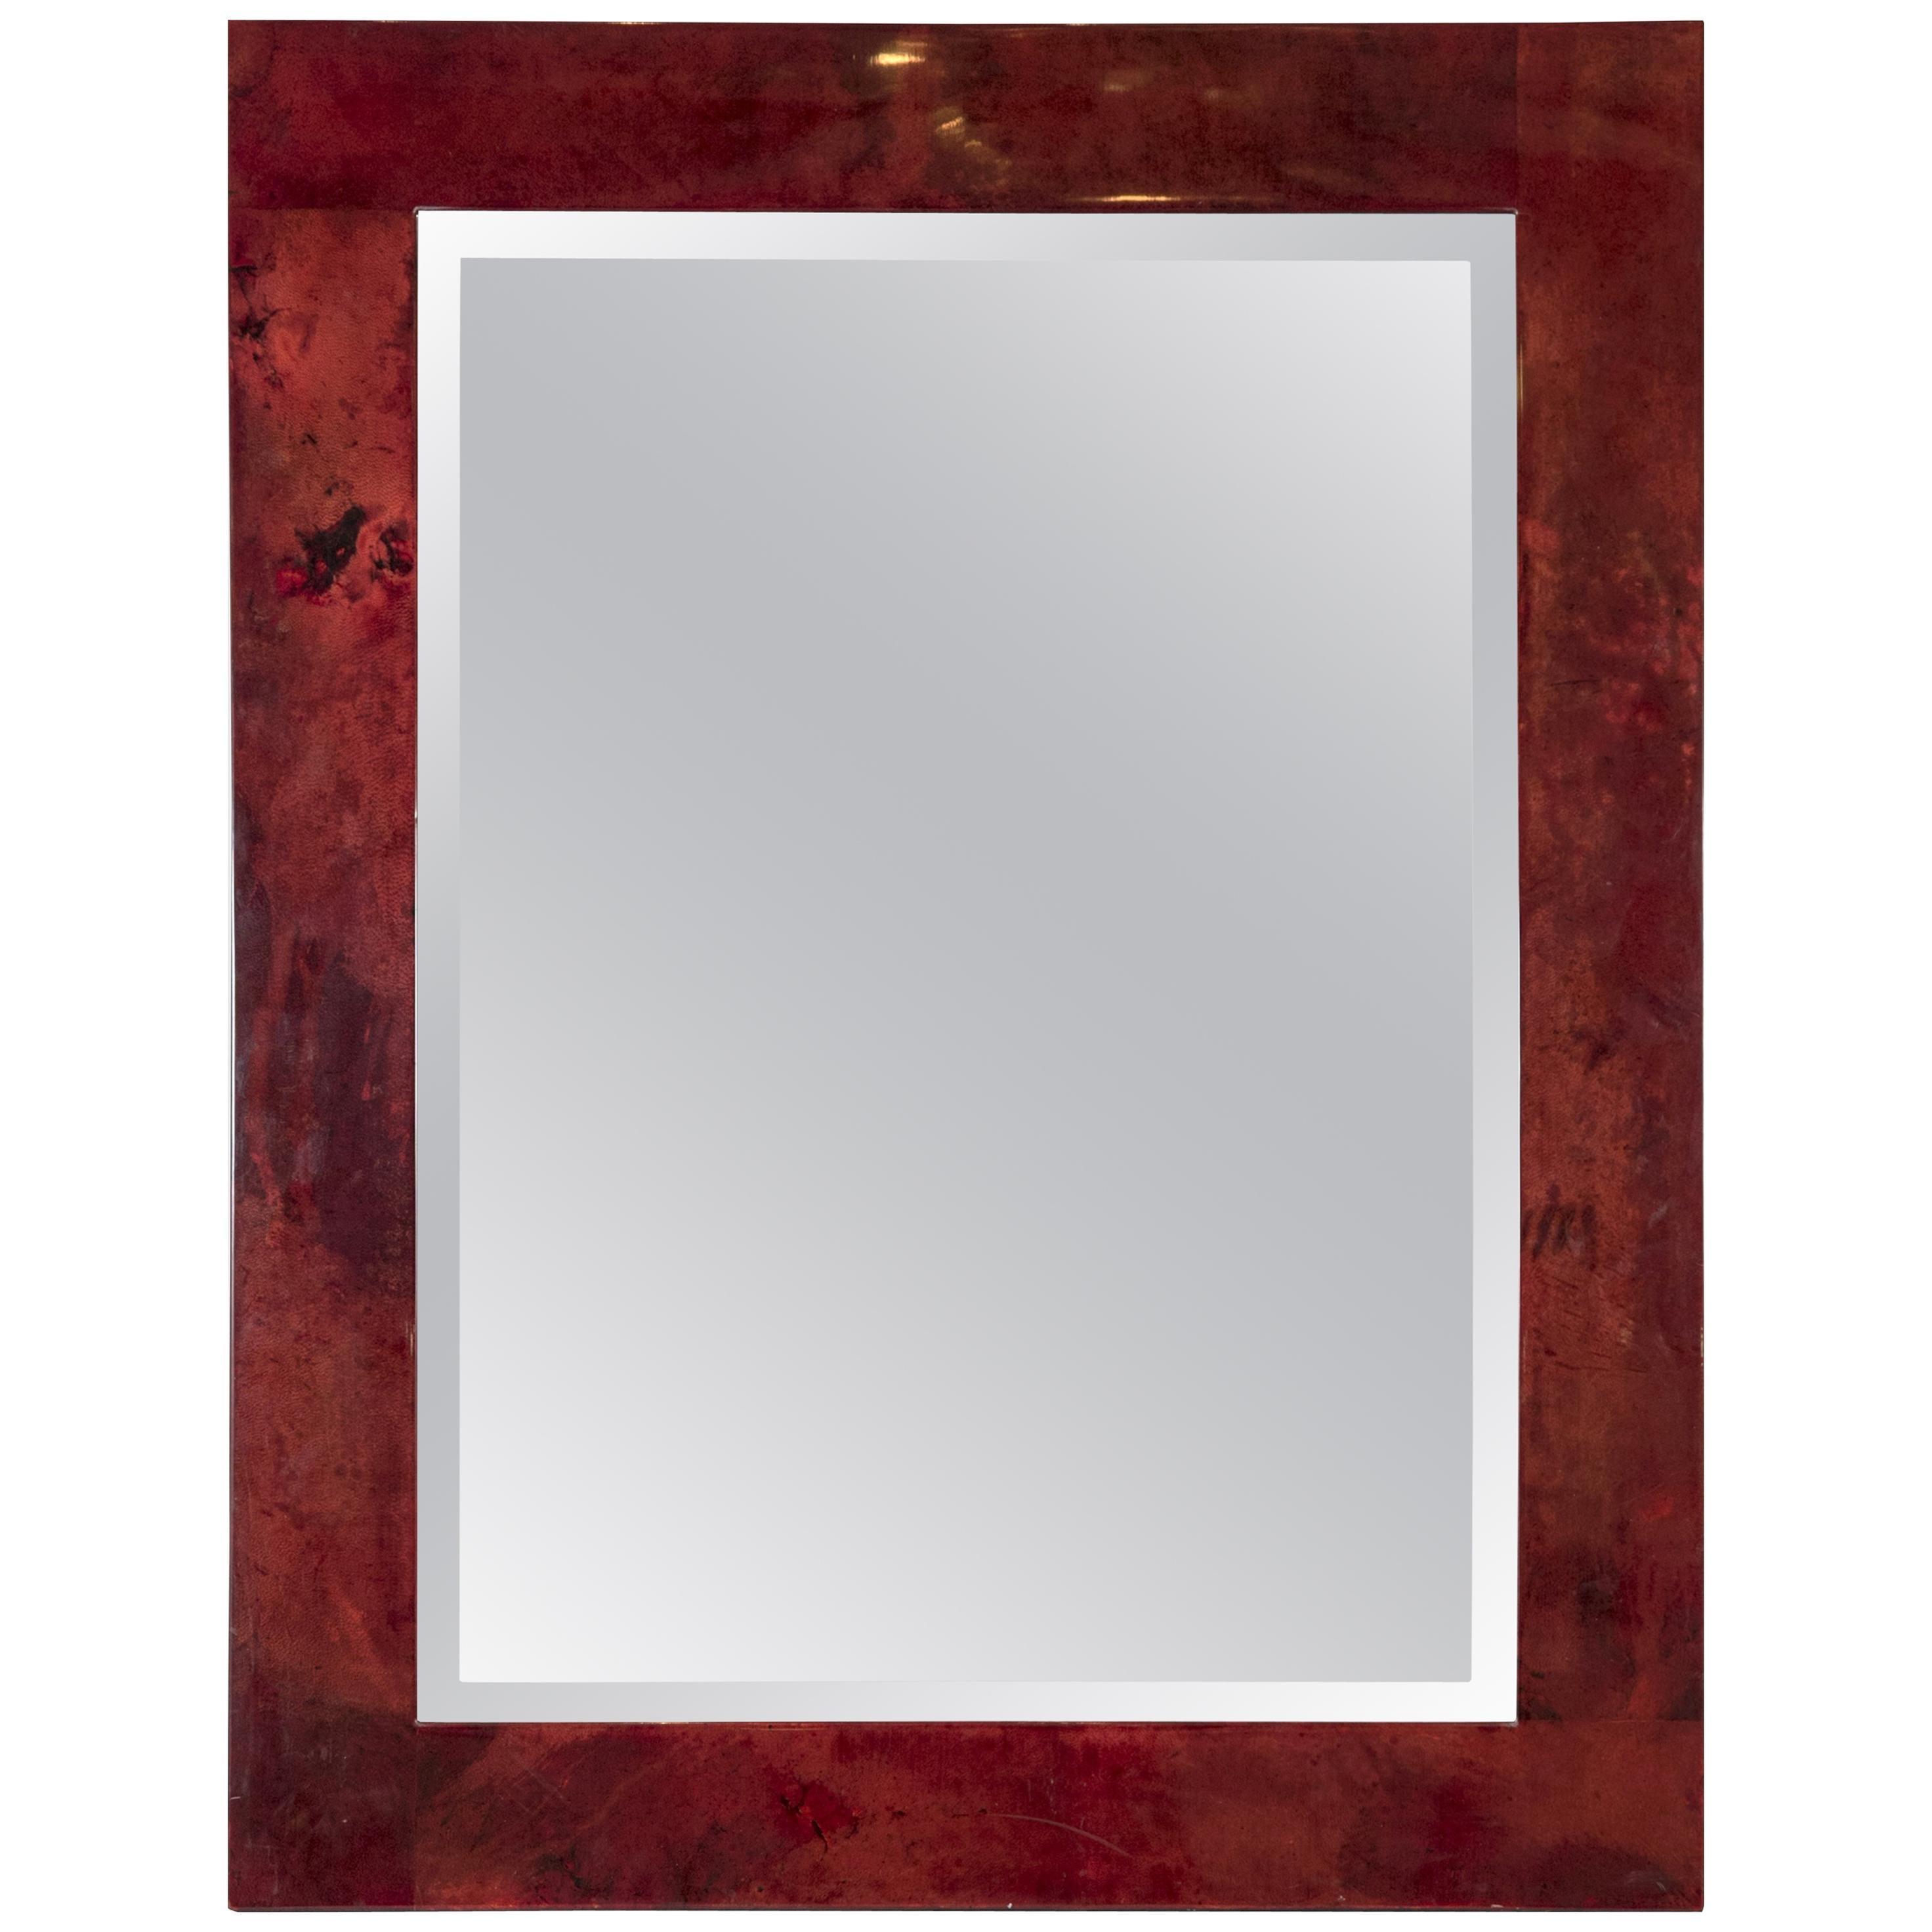 Rare Red Goatskin Wall Mirror by Aldo Tura